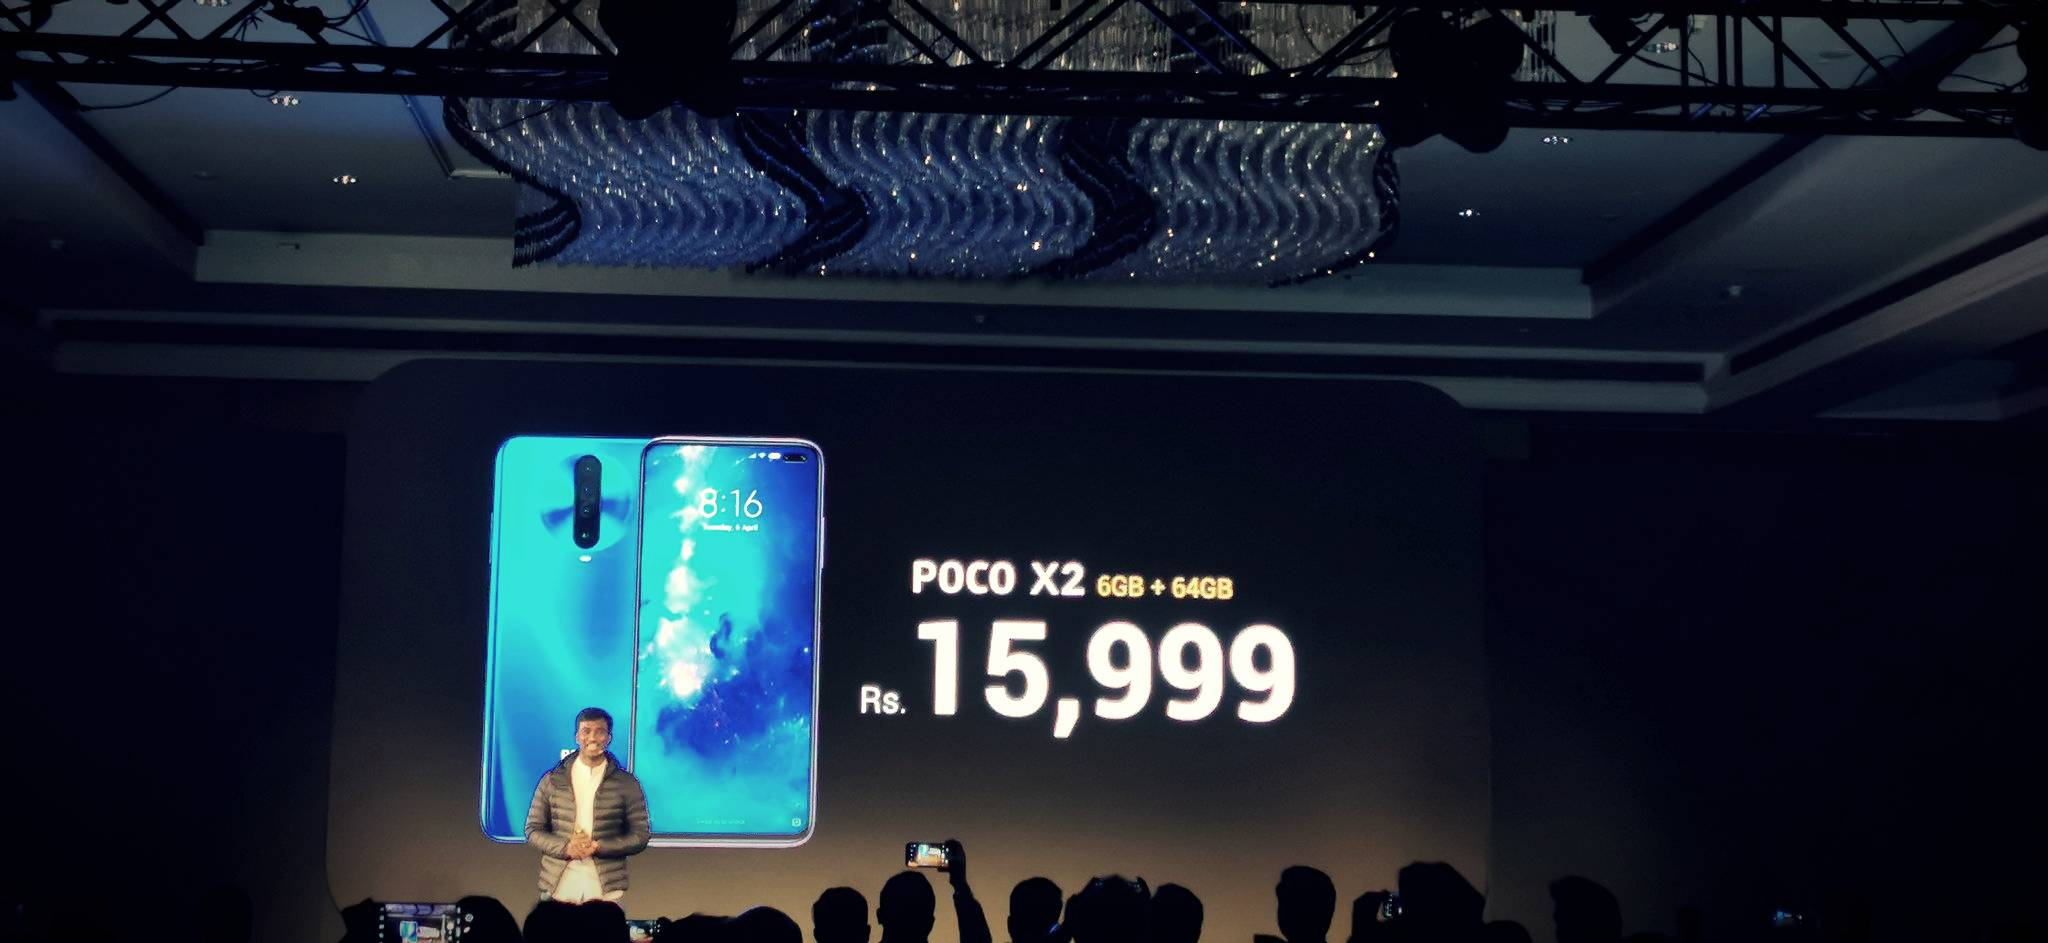 Poco X2 image i